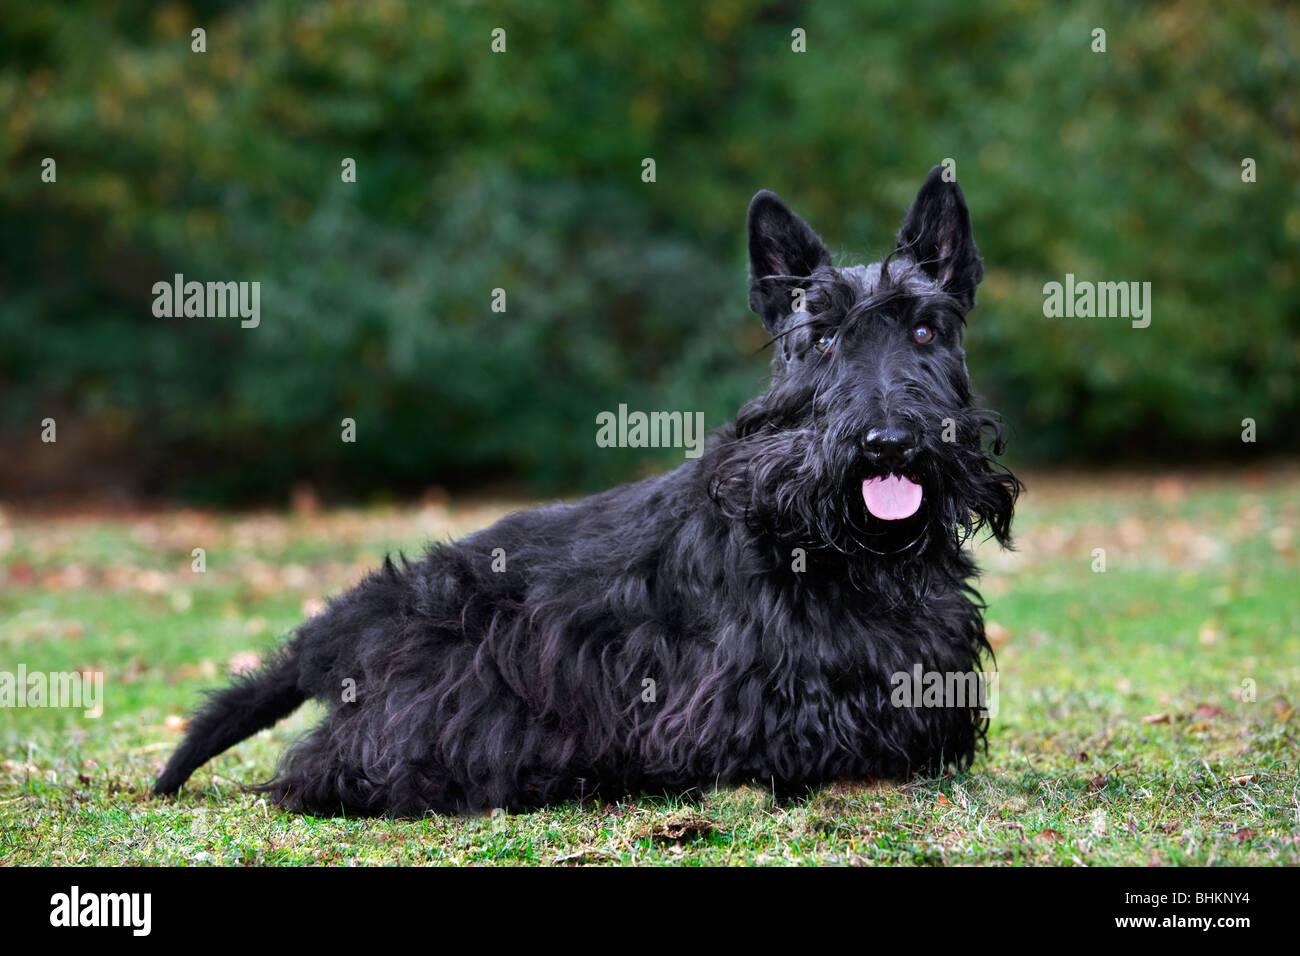 scottie dog stock photos scottie dog stock images alamy